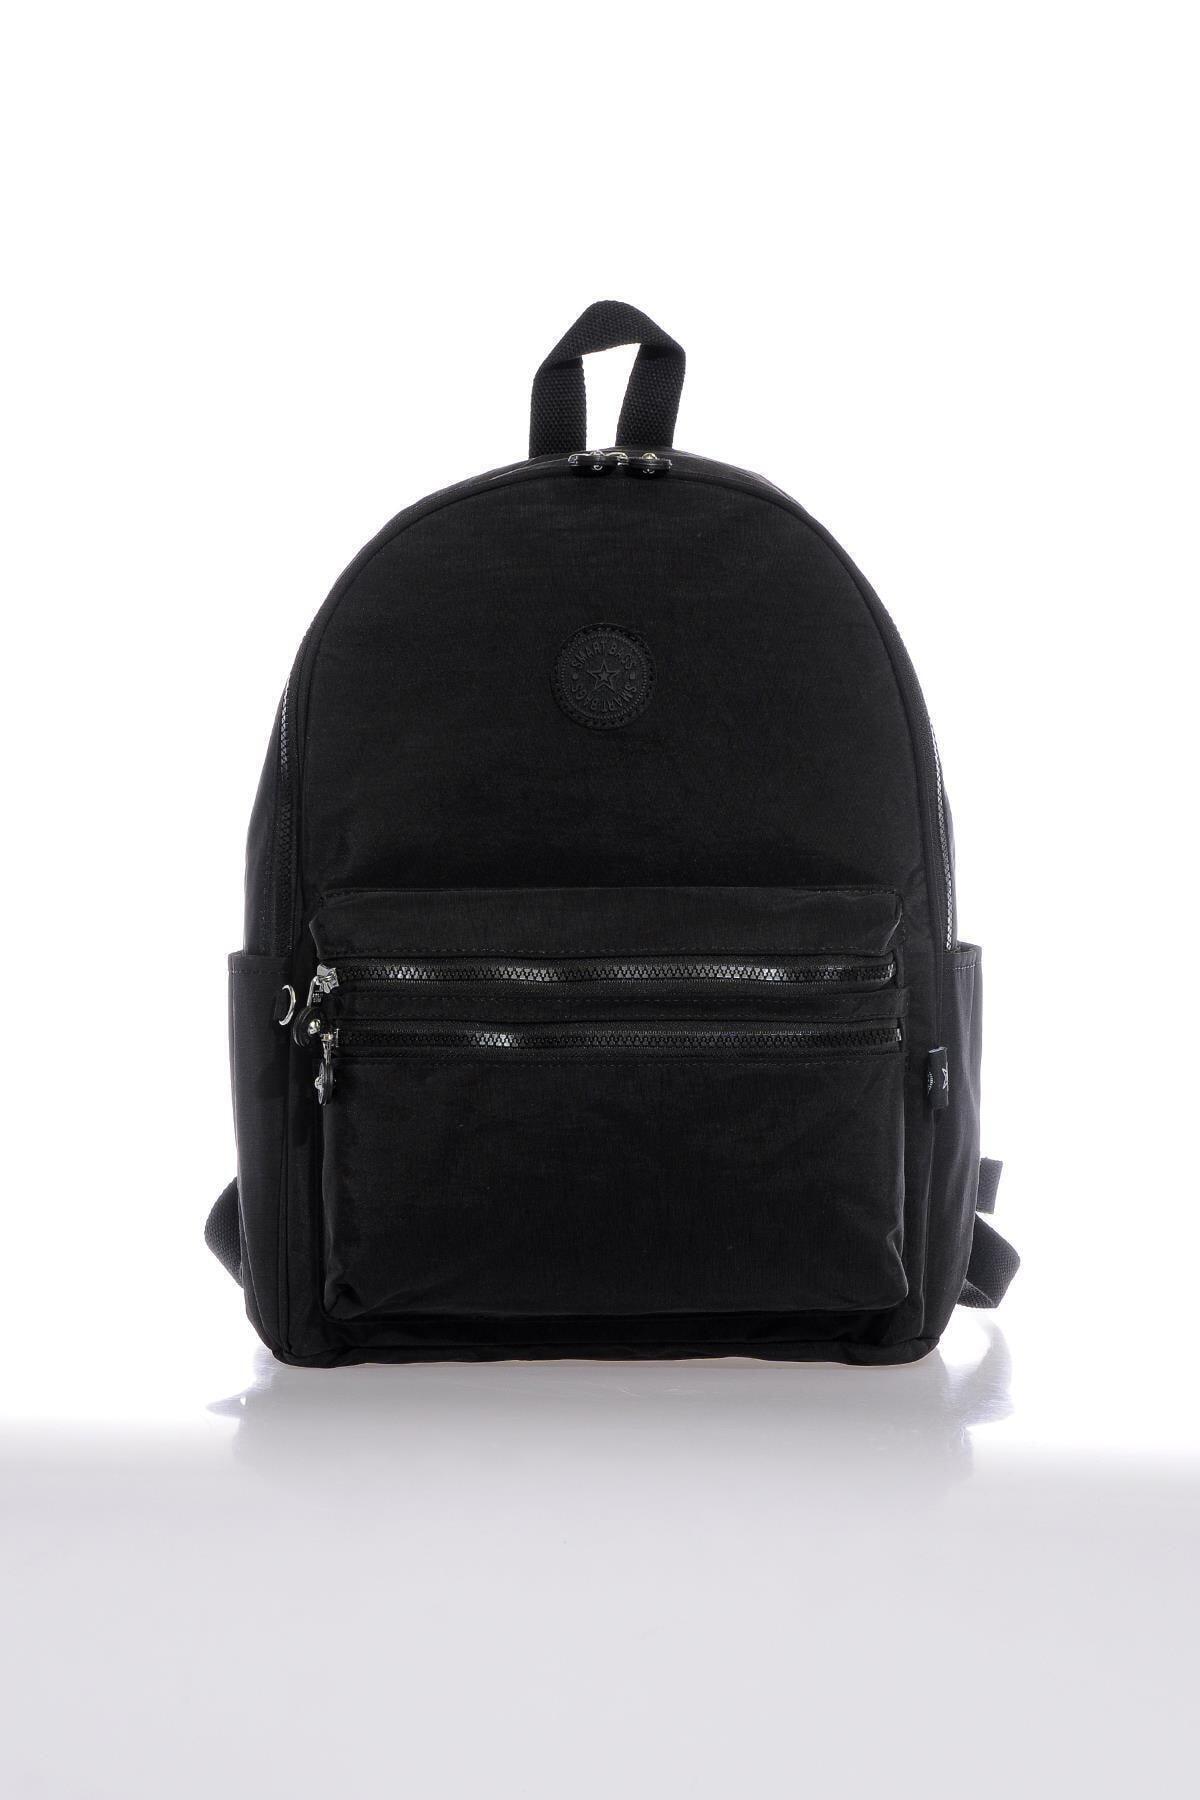 SMART BAGS Smb3078-0001 Siyah Kadın Sırt Çantası 1